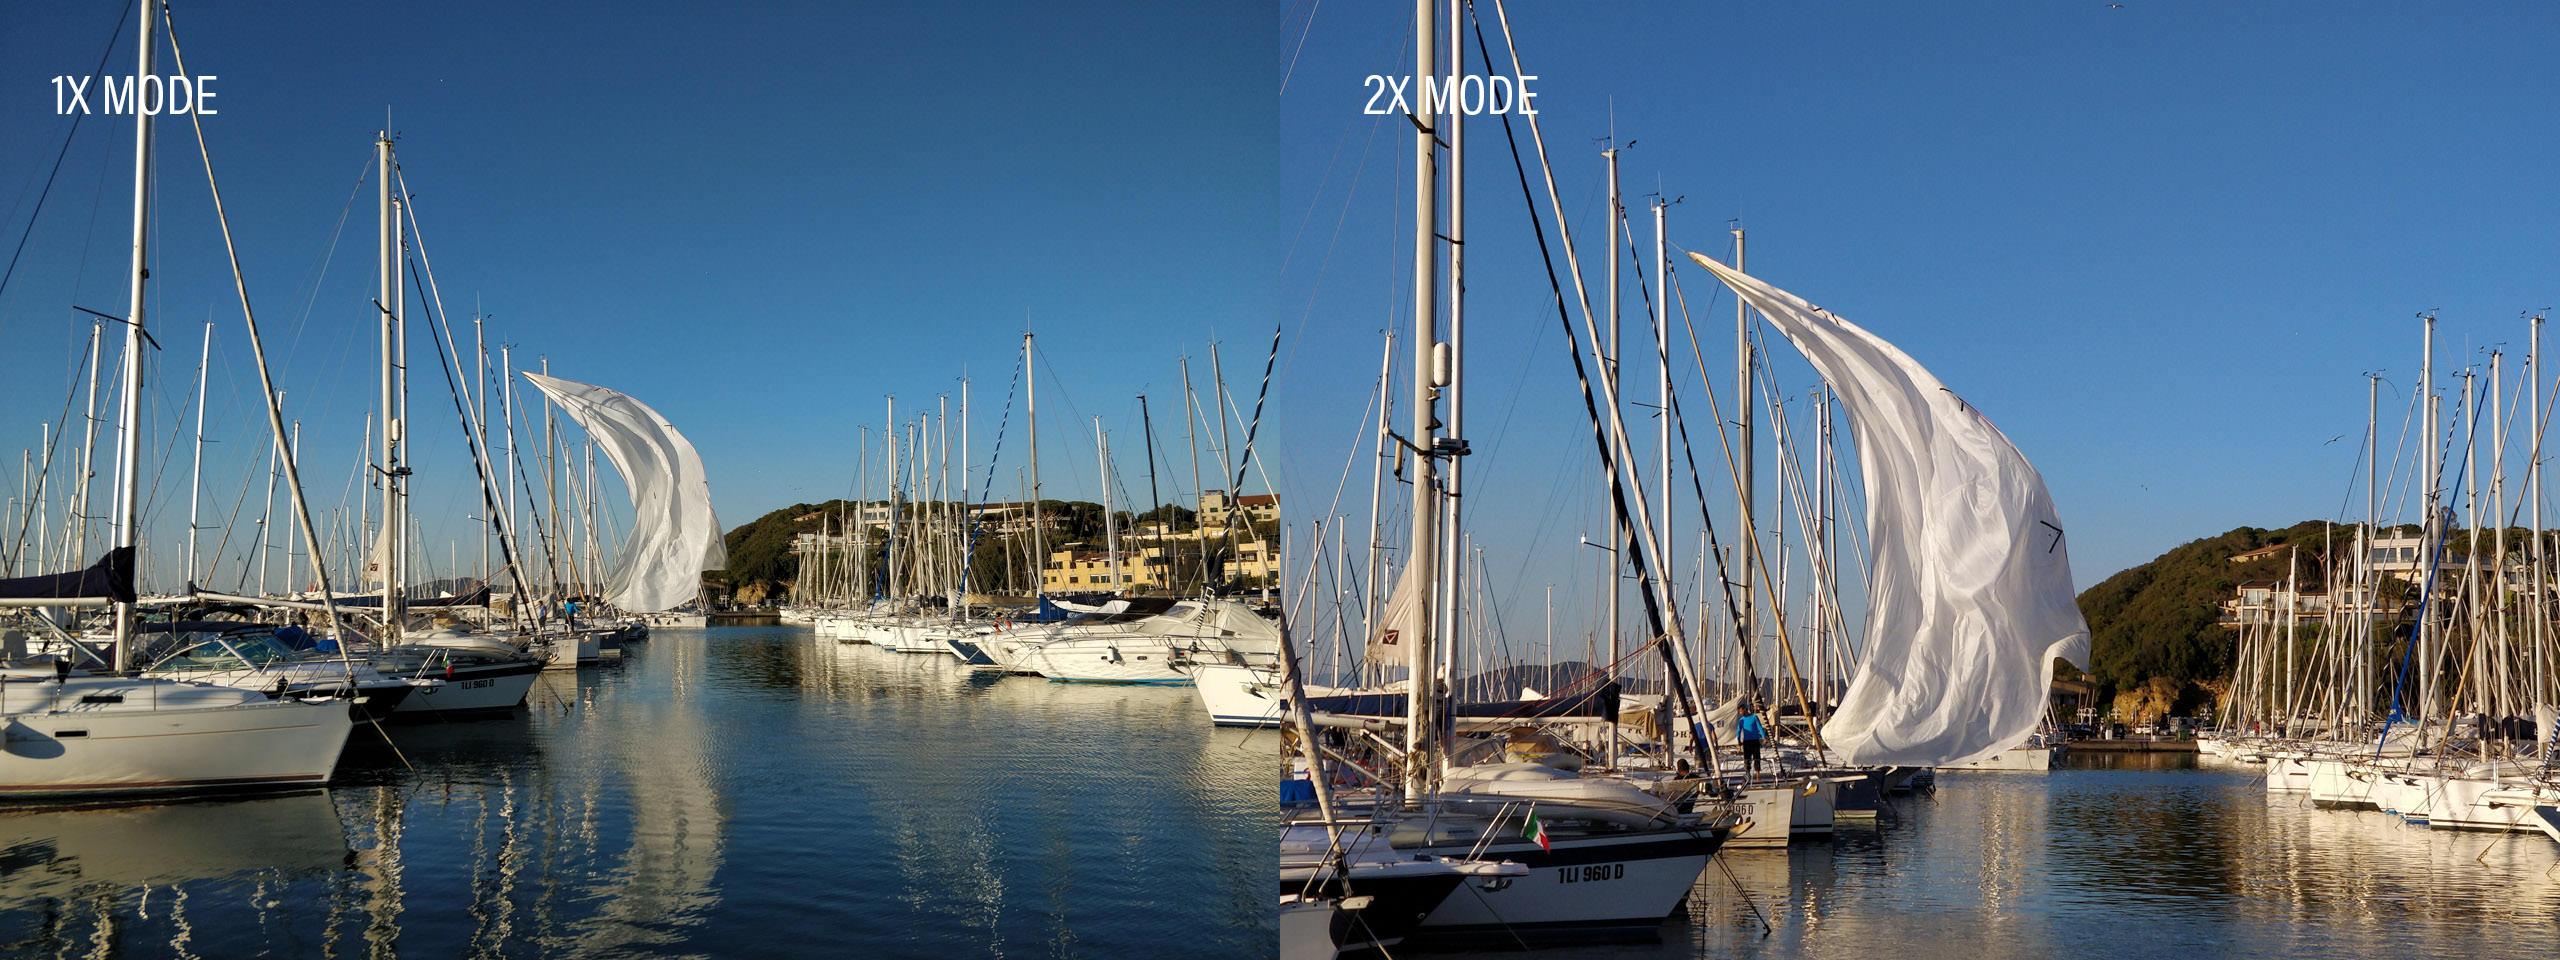 oneplus 5 photo review alessandro michelazzi 1x 2x mode